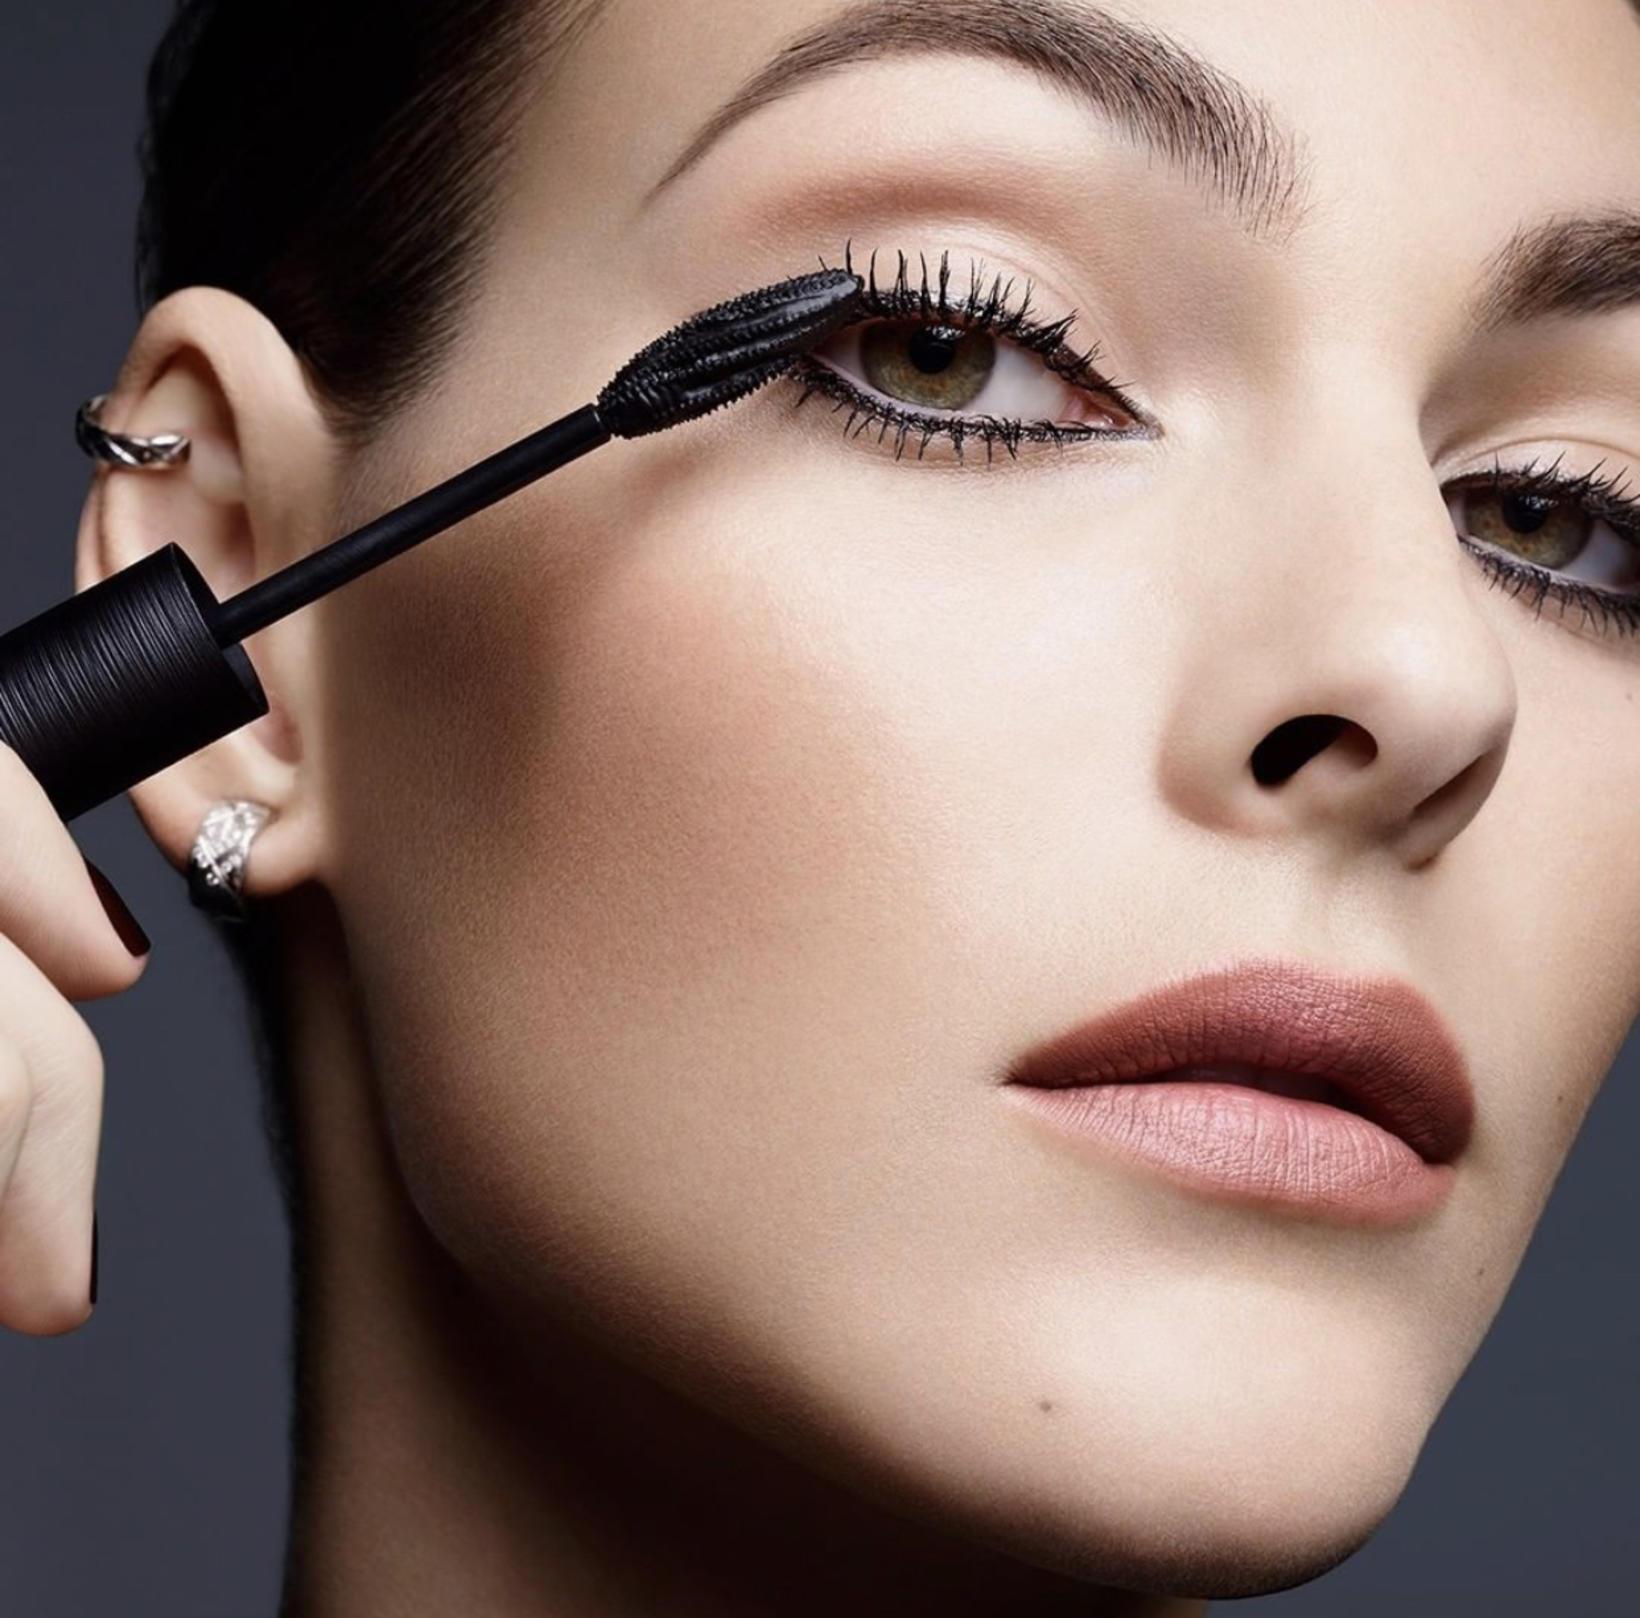 Chanel Le Volume Stretch De Chanel er nýjasti maskarinn frá …